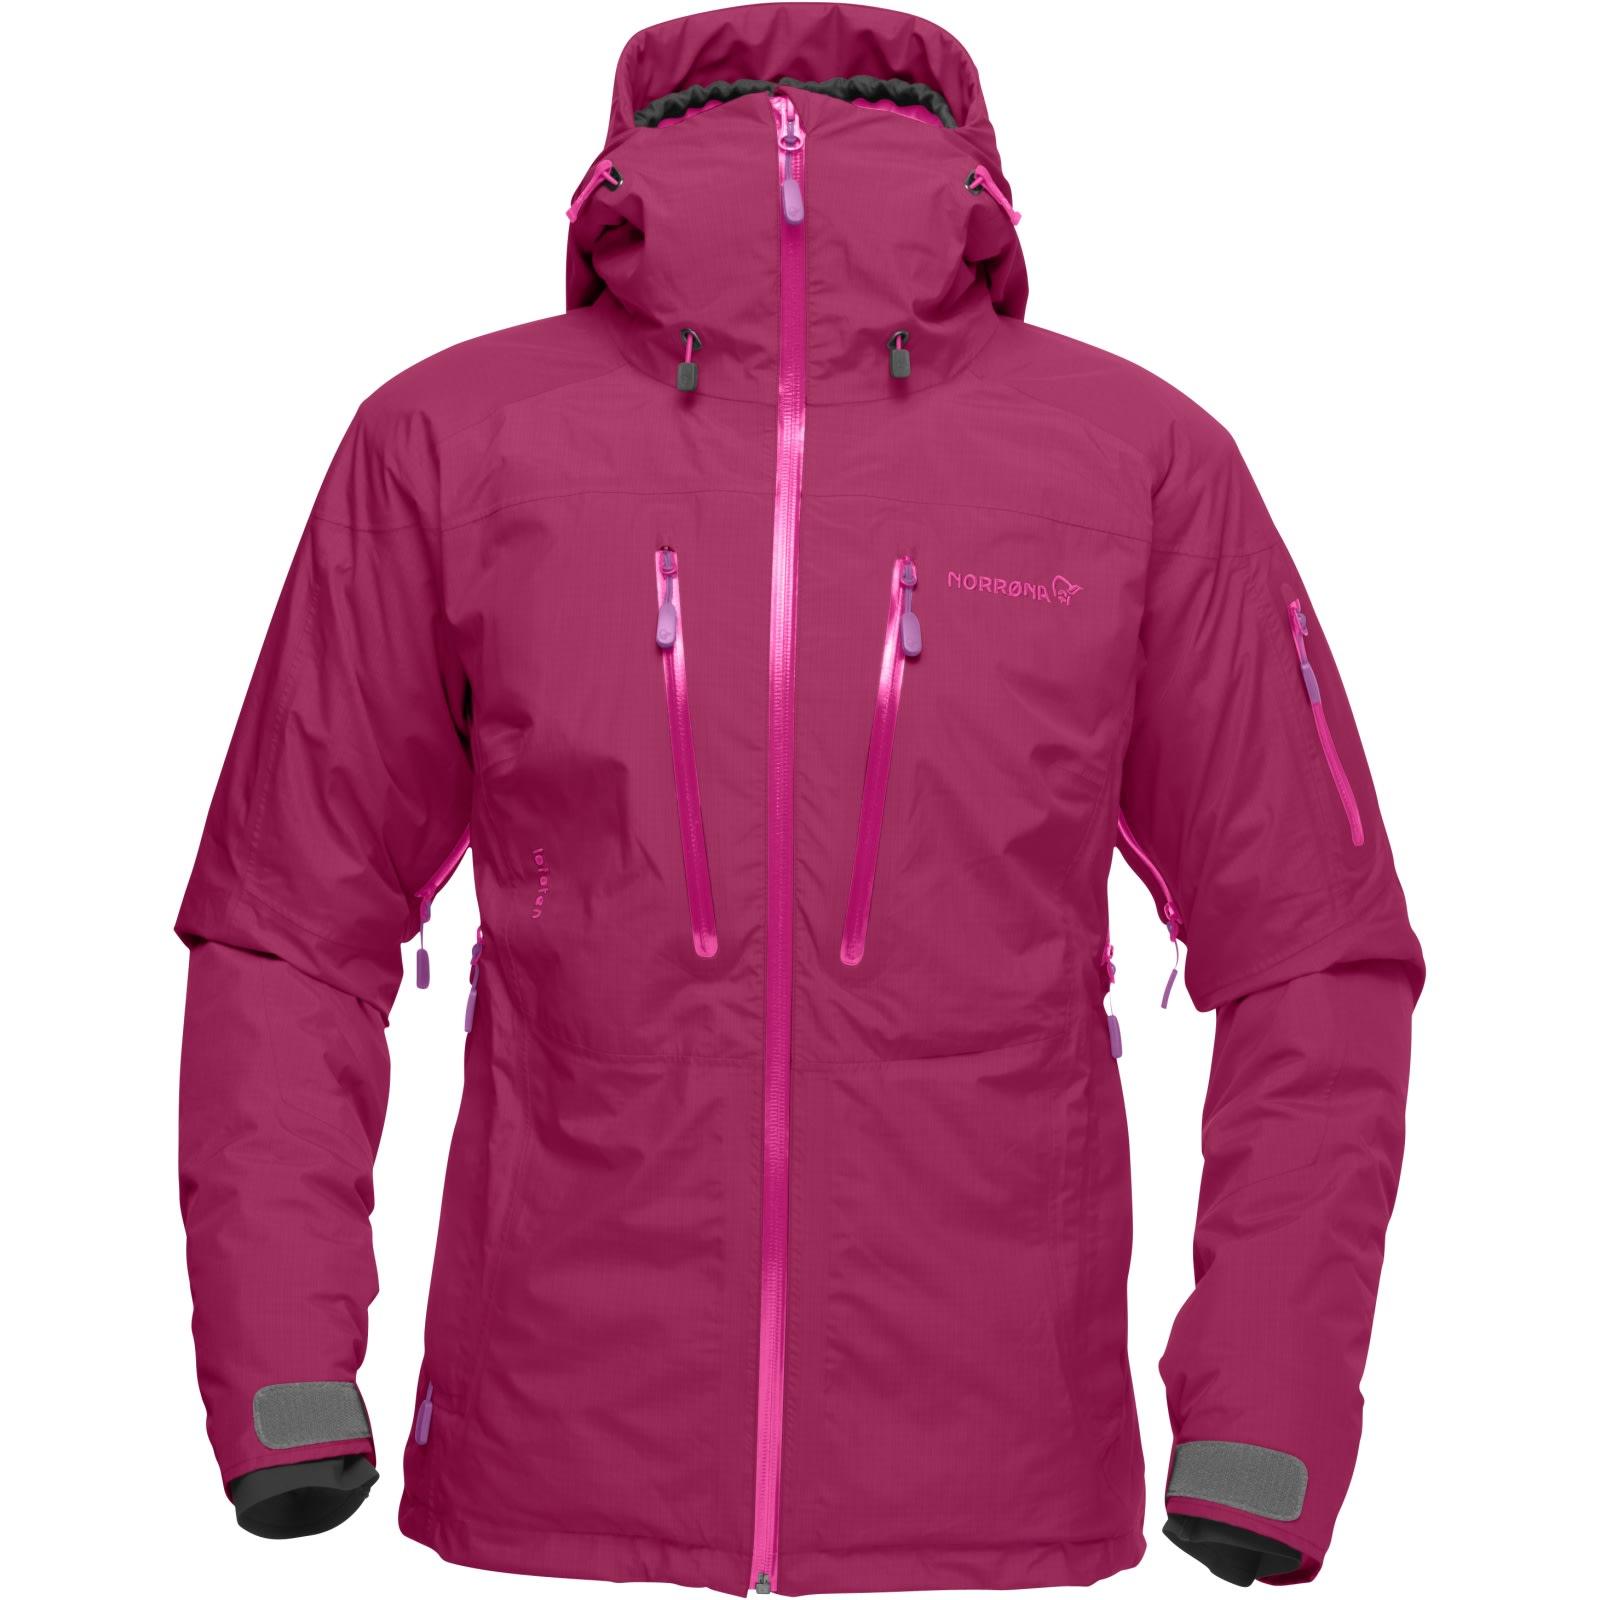 Norrøna lofoten Gore Tex Primaloft jakke for ski til herre